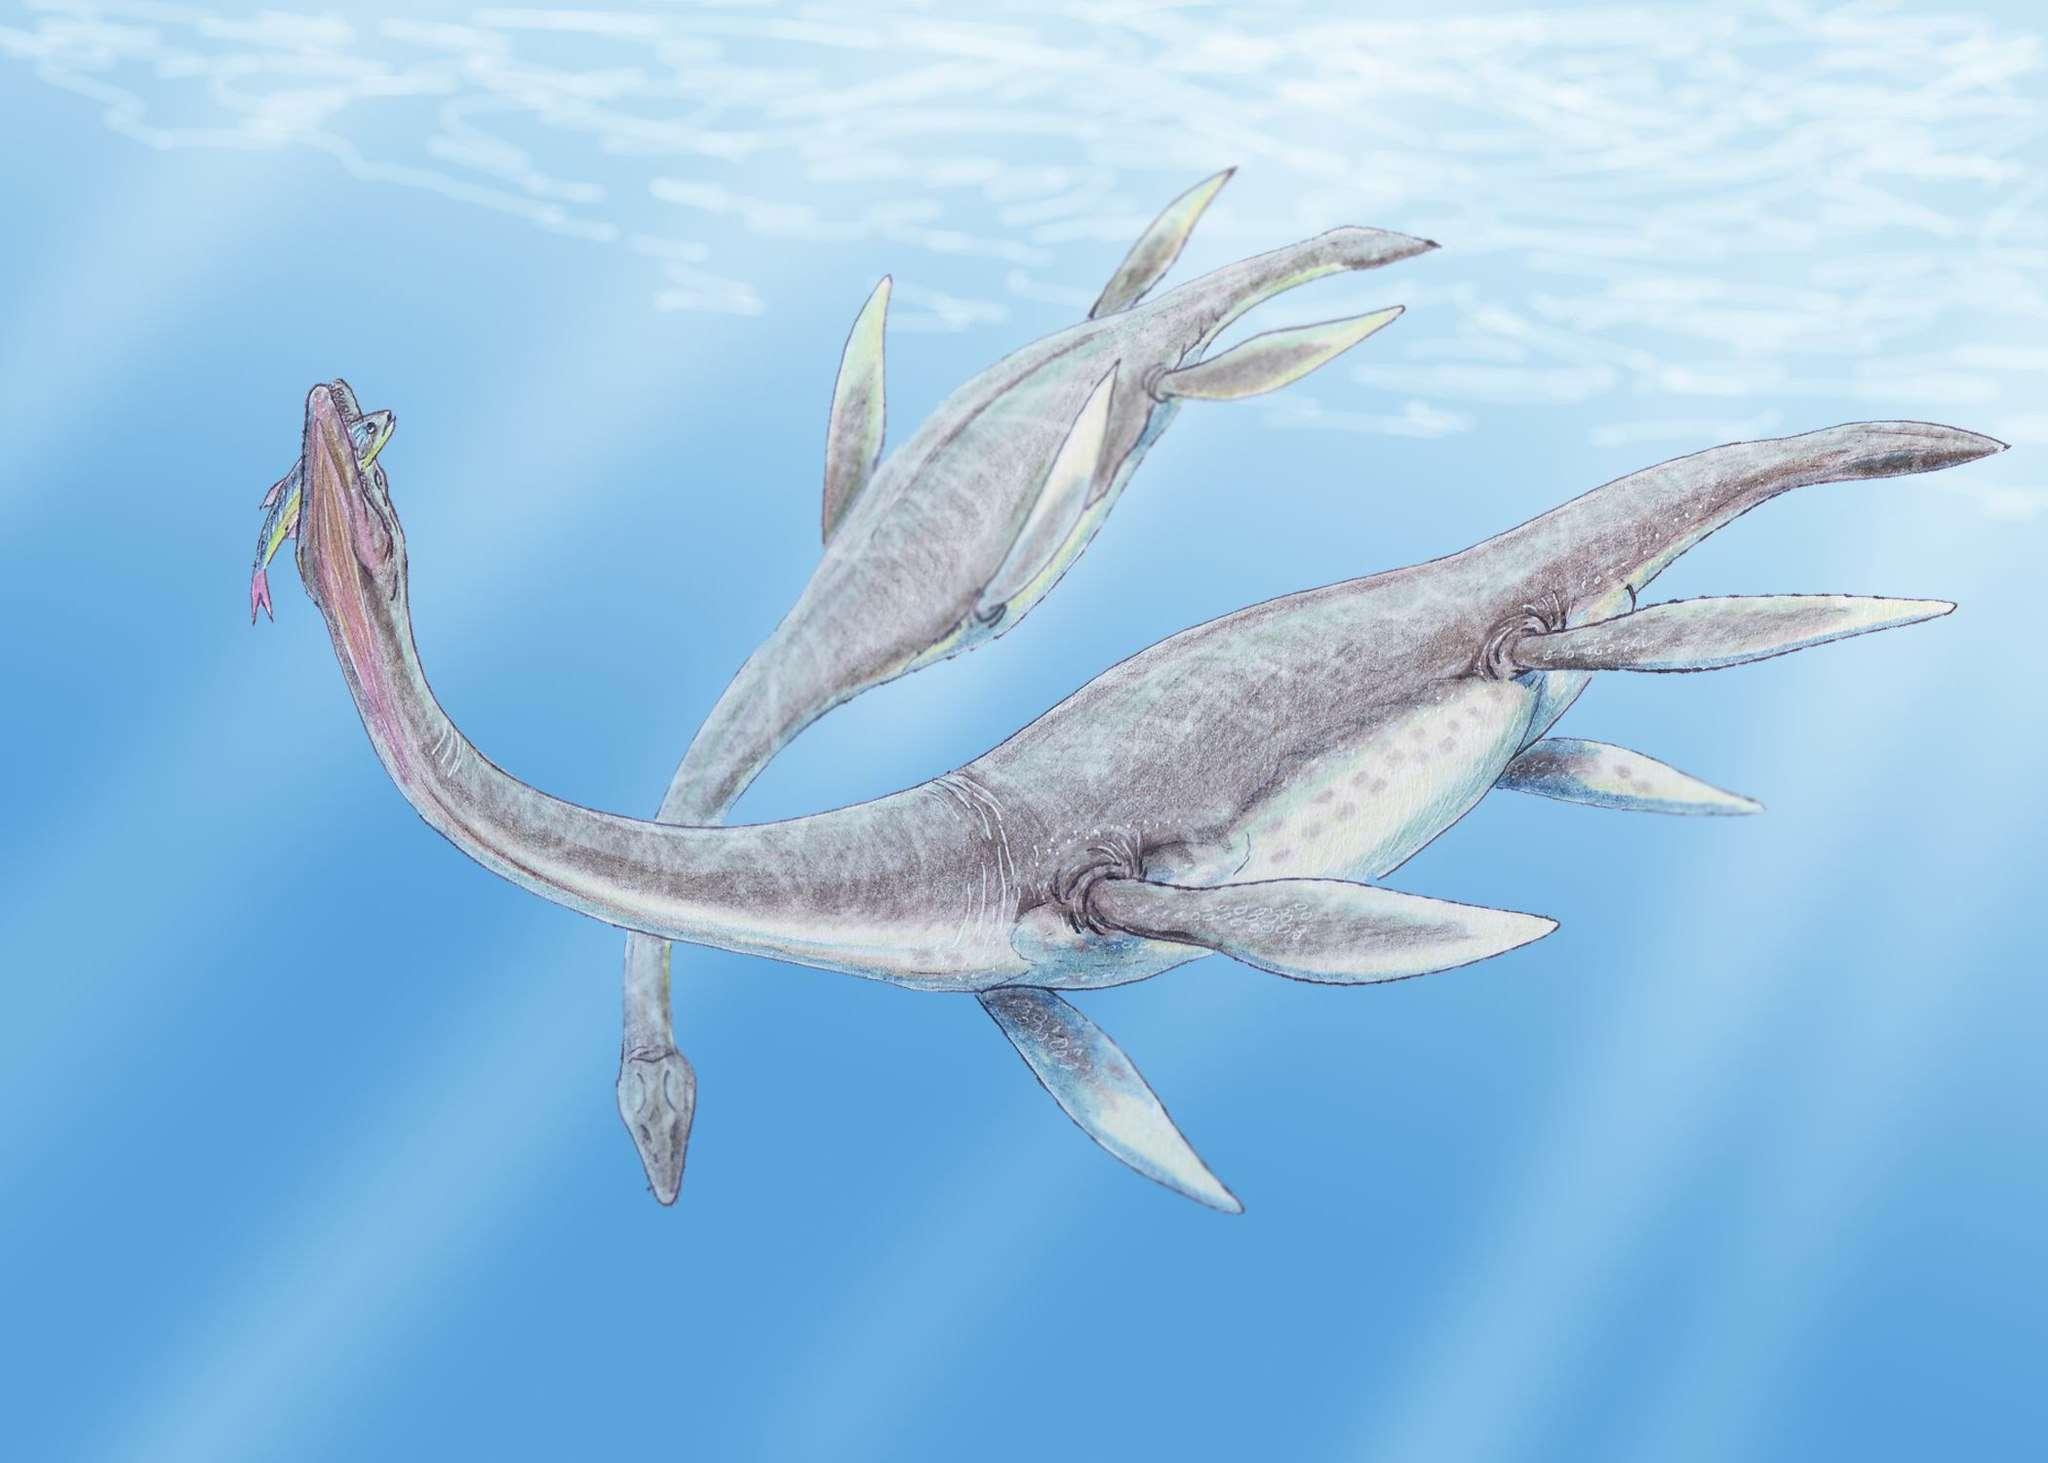 pastel illustration of plesiosaurus underwater, long neck and biting fish